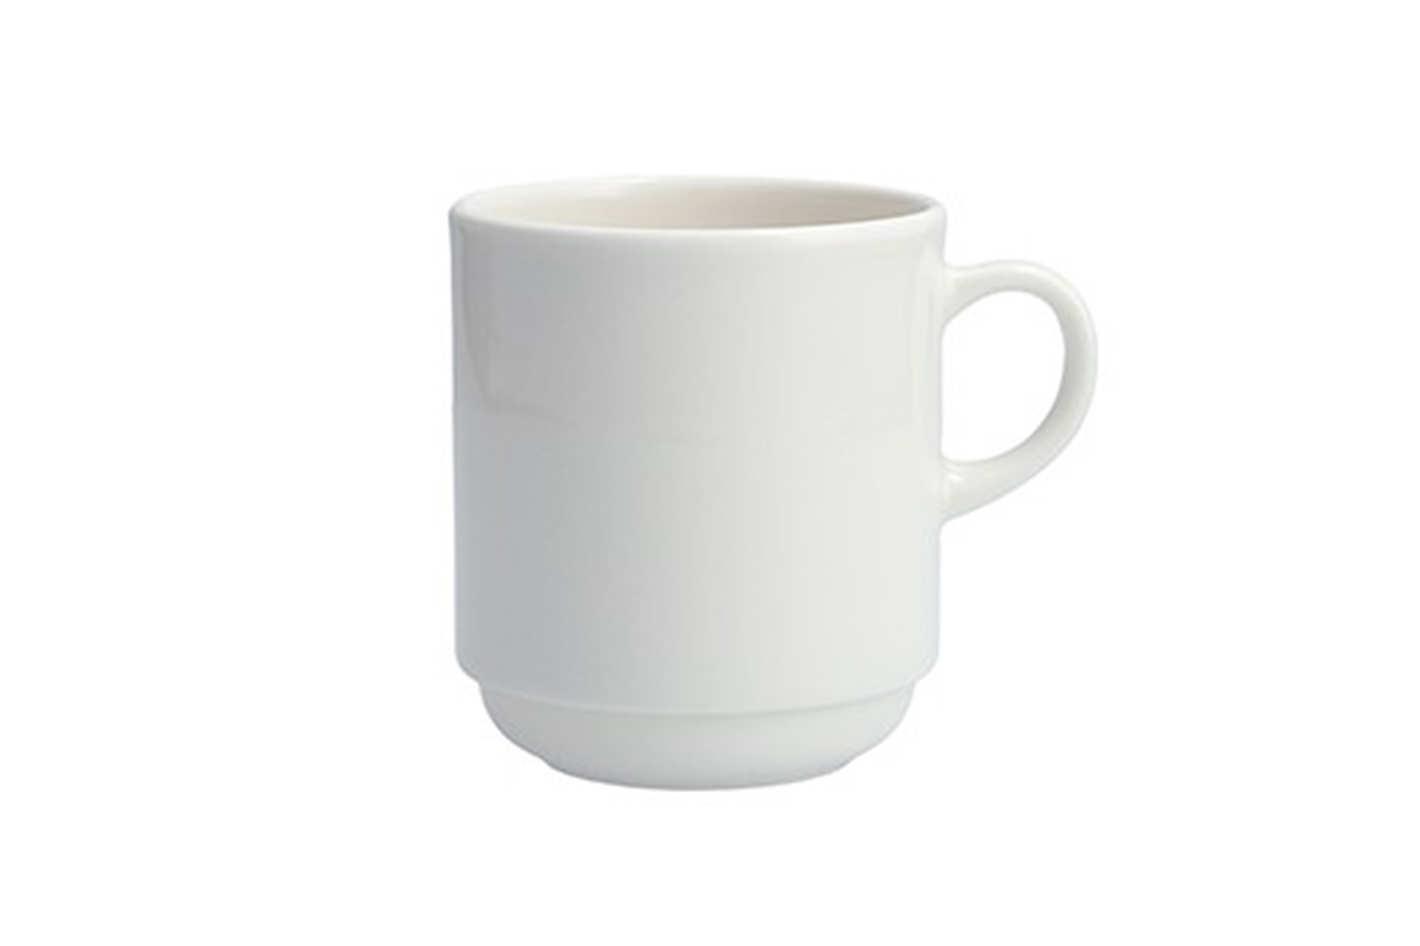 Fortessa Ilona Stackable Mug - Set of 4